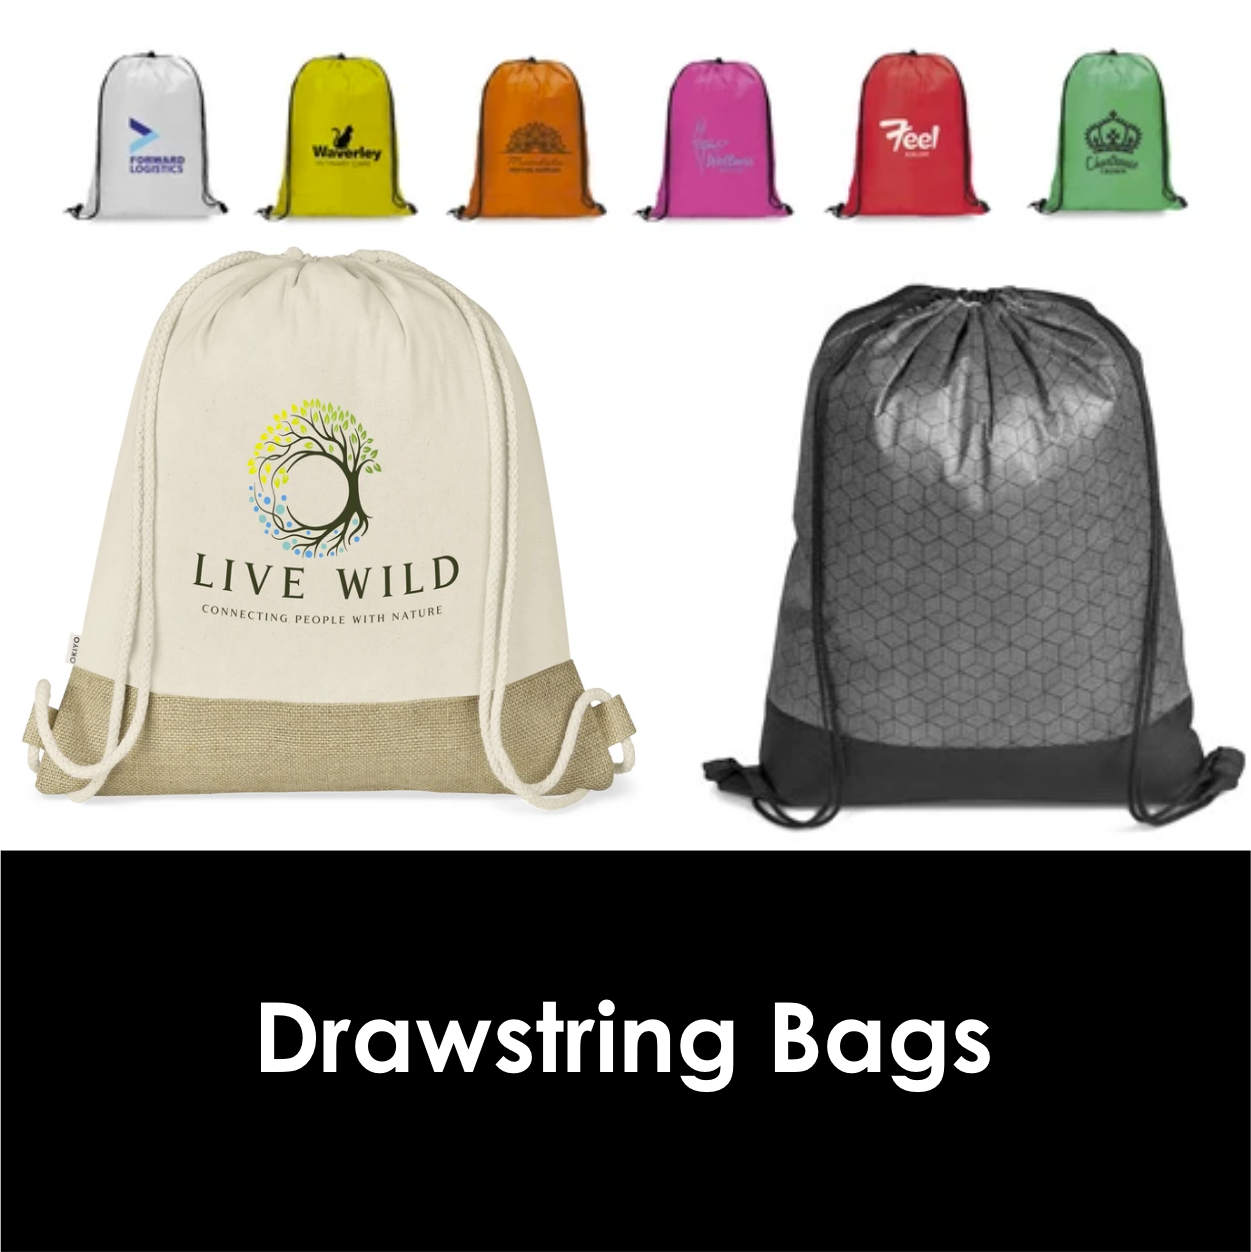 Redblock Advertising Media Drawstring Bags